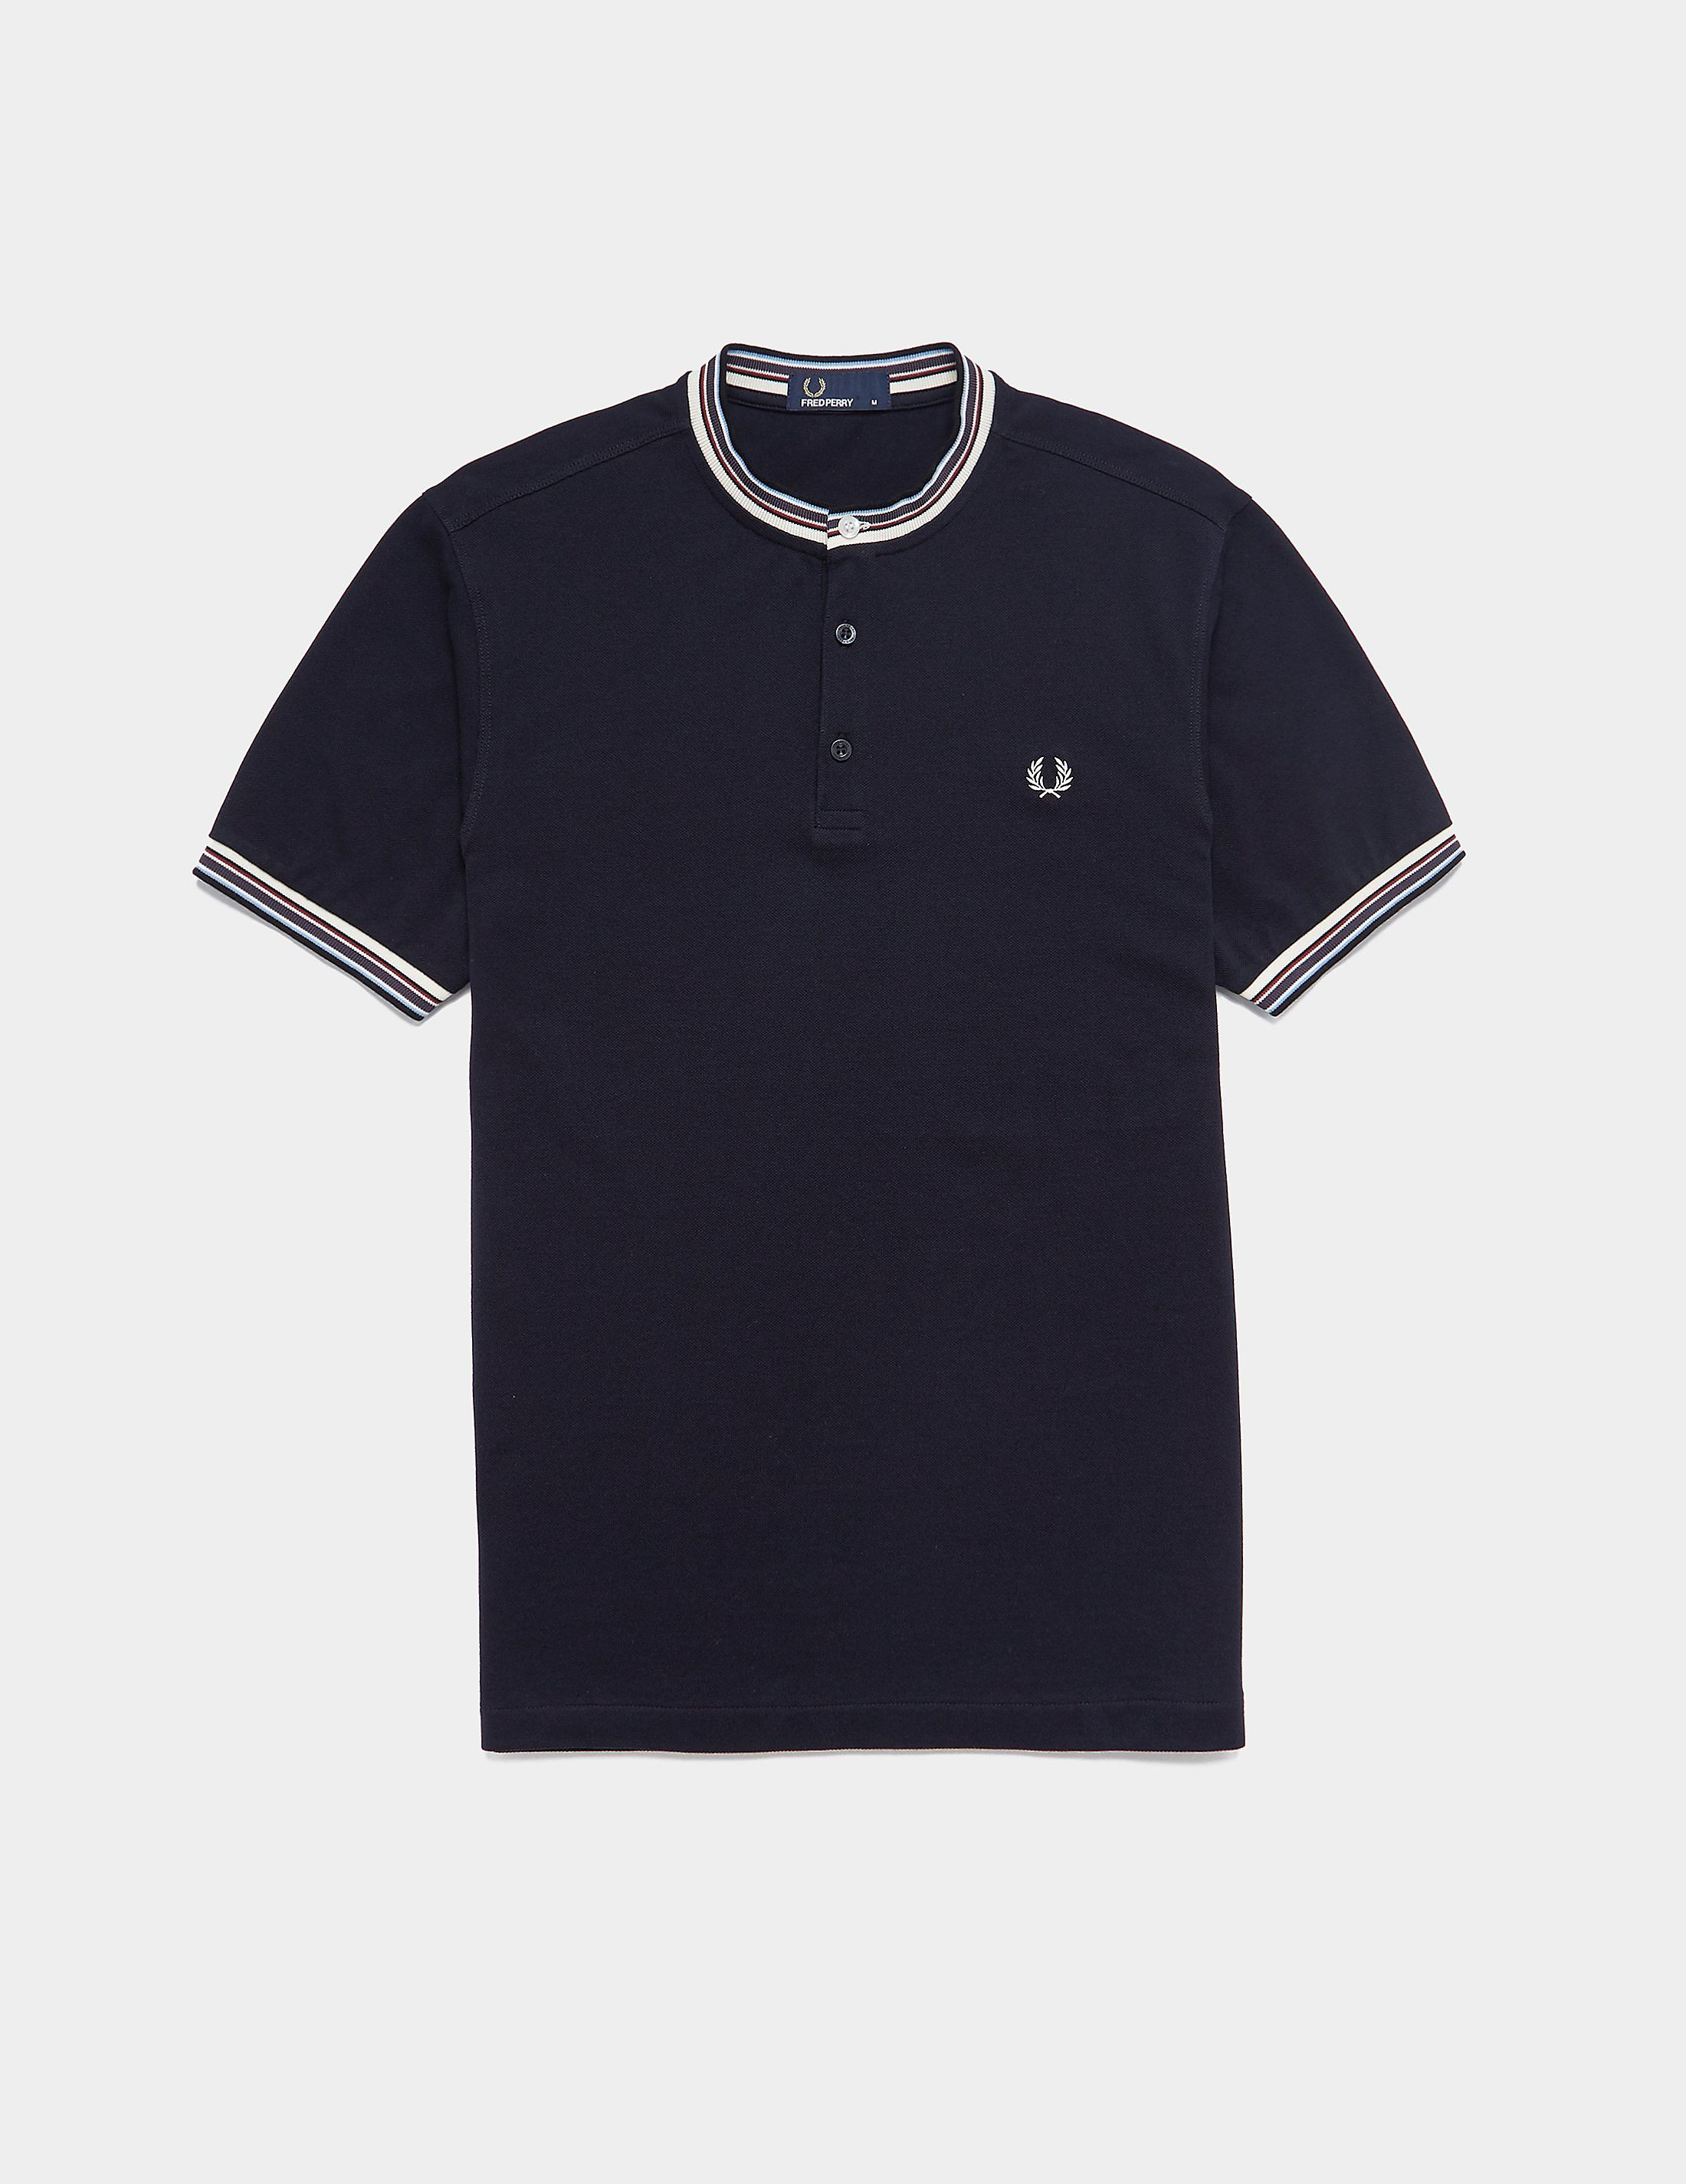 8f3d5b812 Fred Perry Henley Pique Short Sleeve Polo Shirt | Tessuti